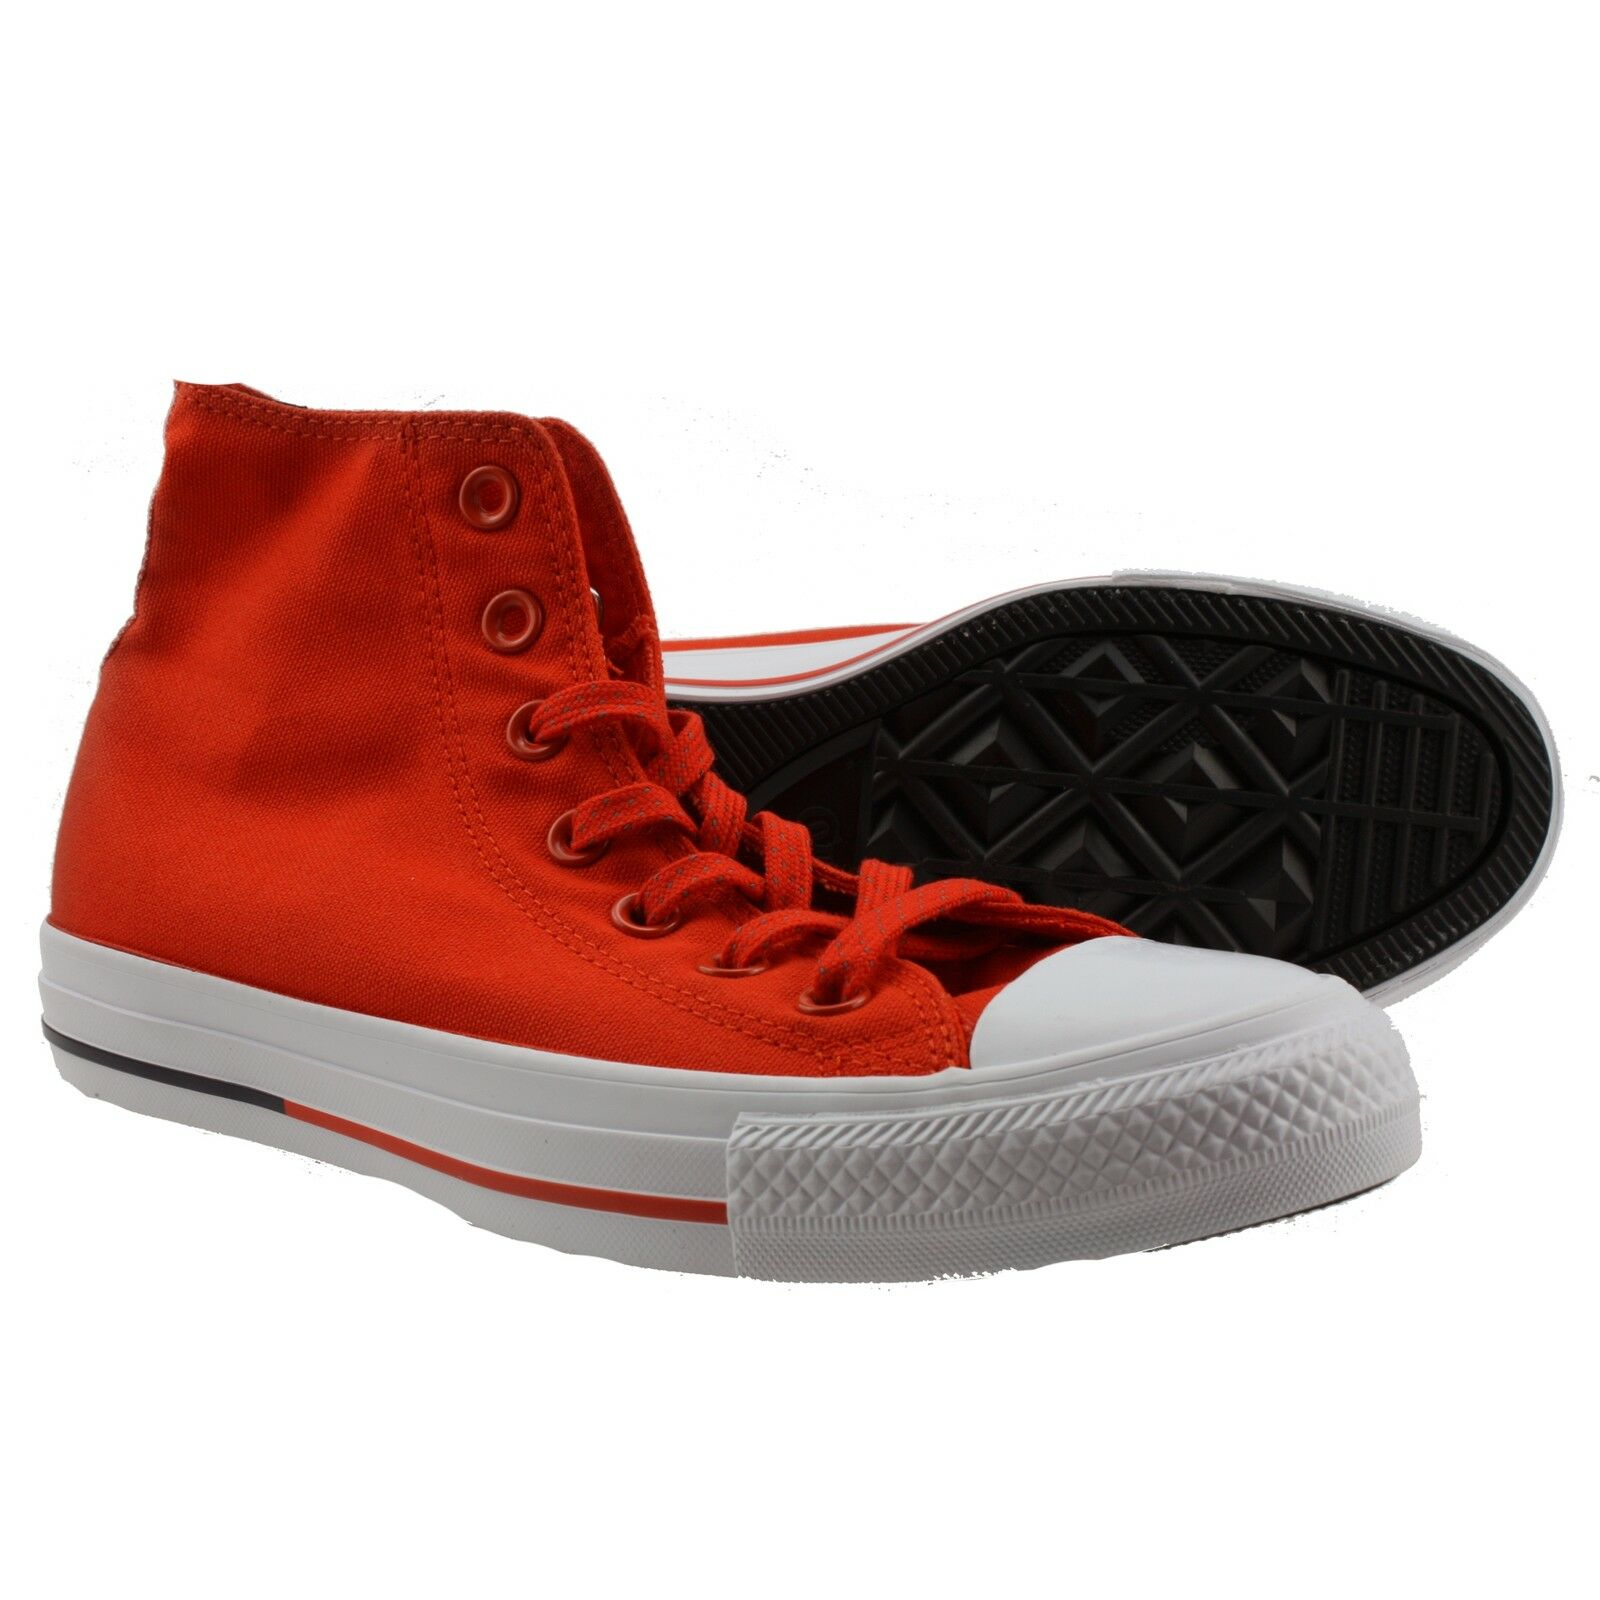 Converse Hi 153794c señal red/white/obsidiana Chucks zapatos caballero mujer